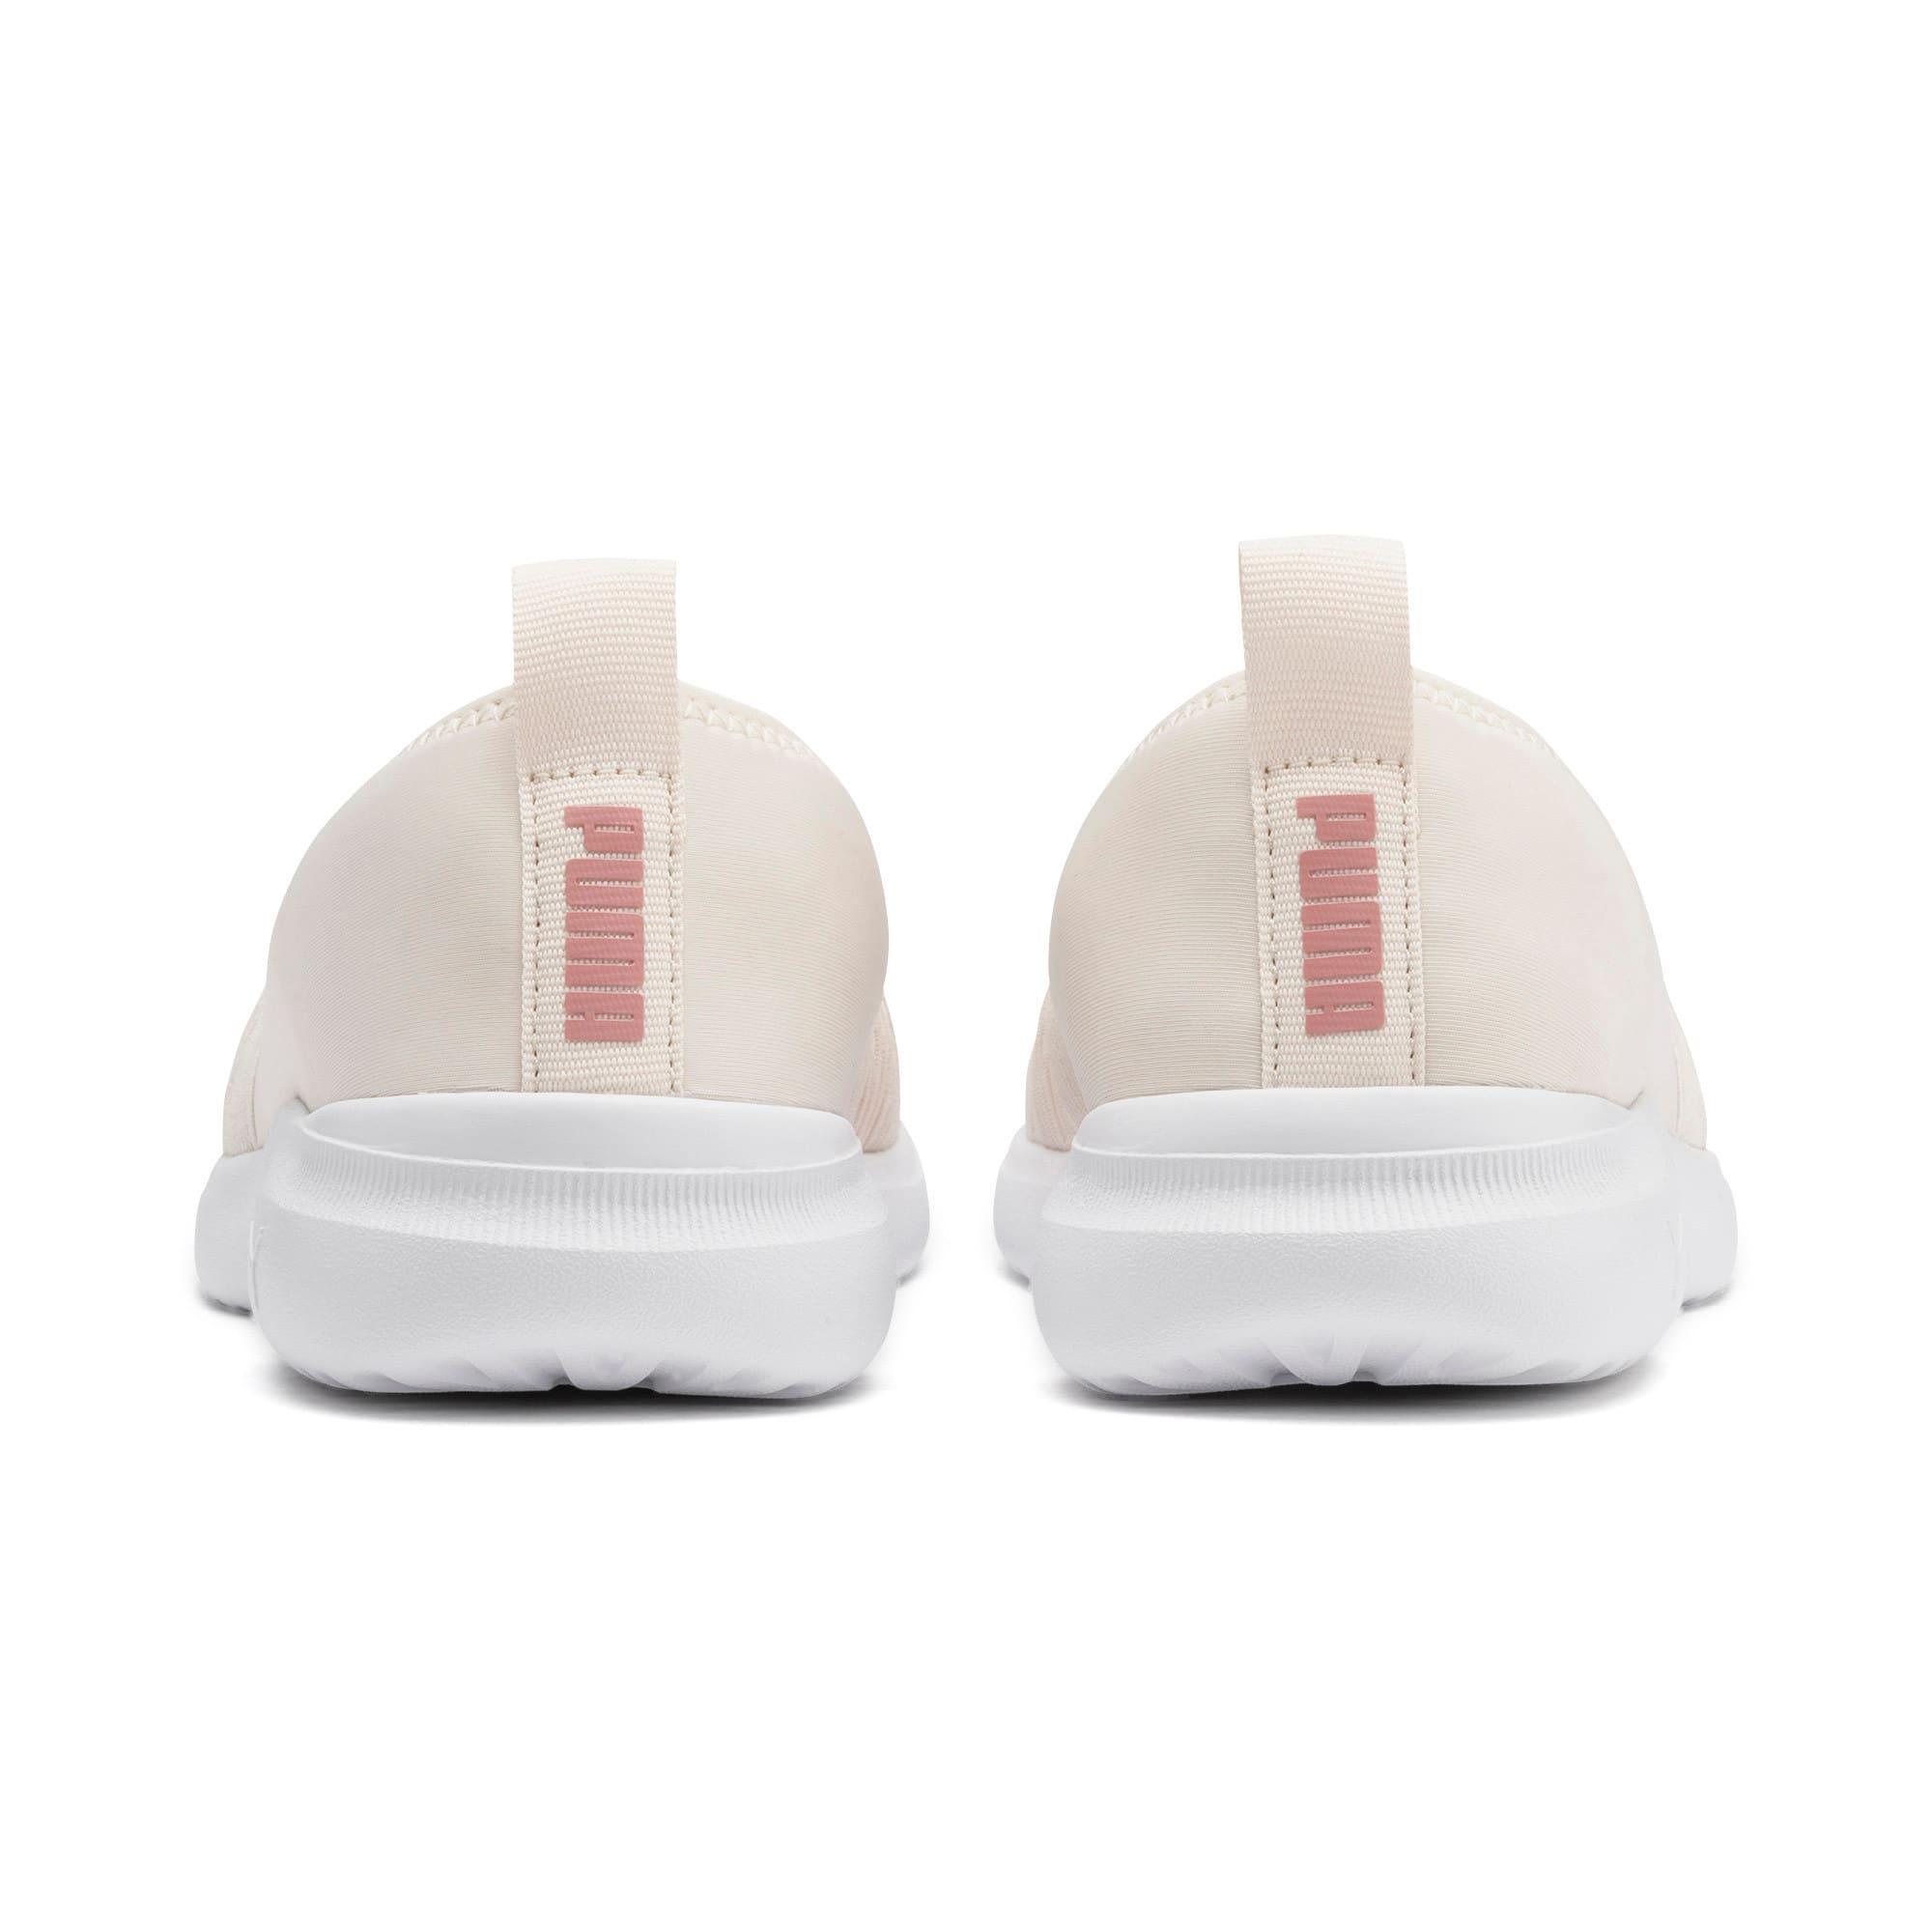 Thumbnail 4 of Adelina Women's Ballet Shoes, Pastel Parchment-B Rose-Wht, medium